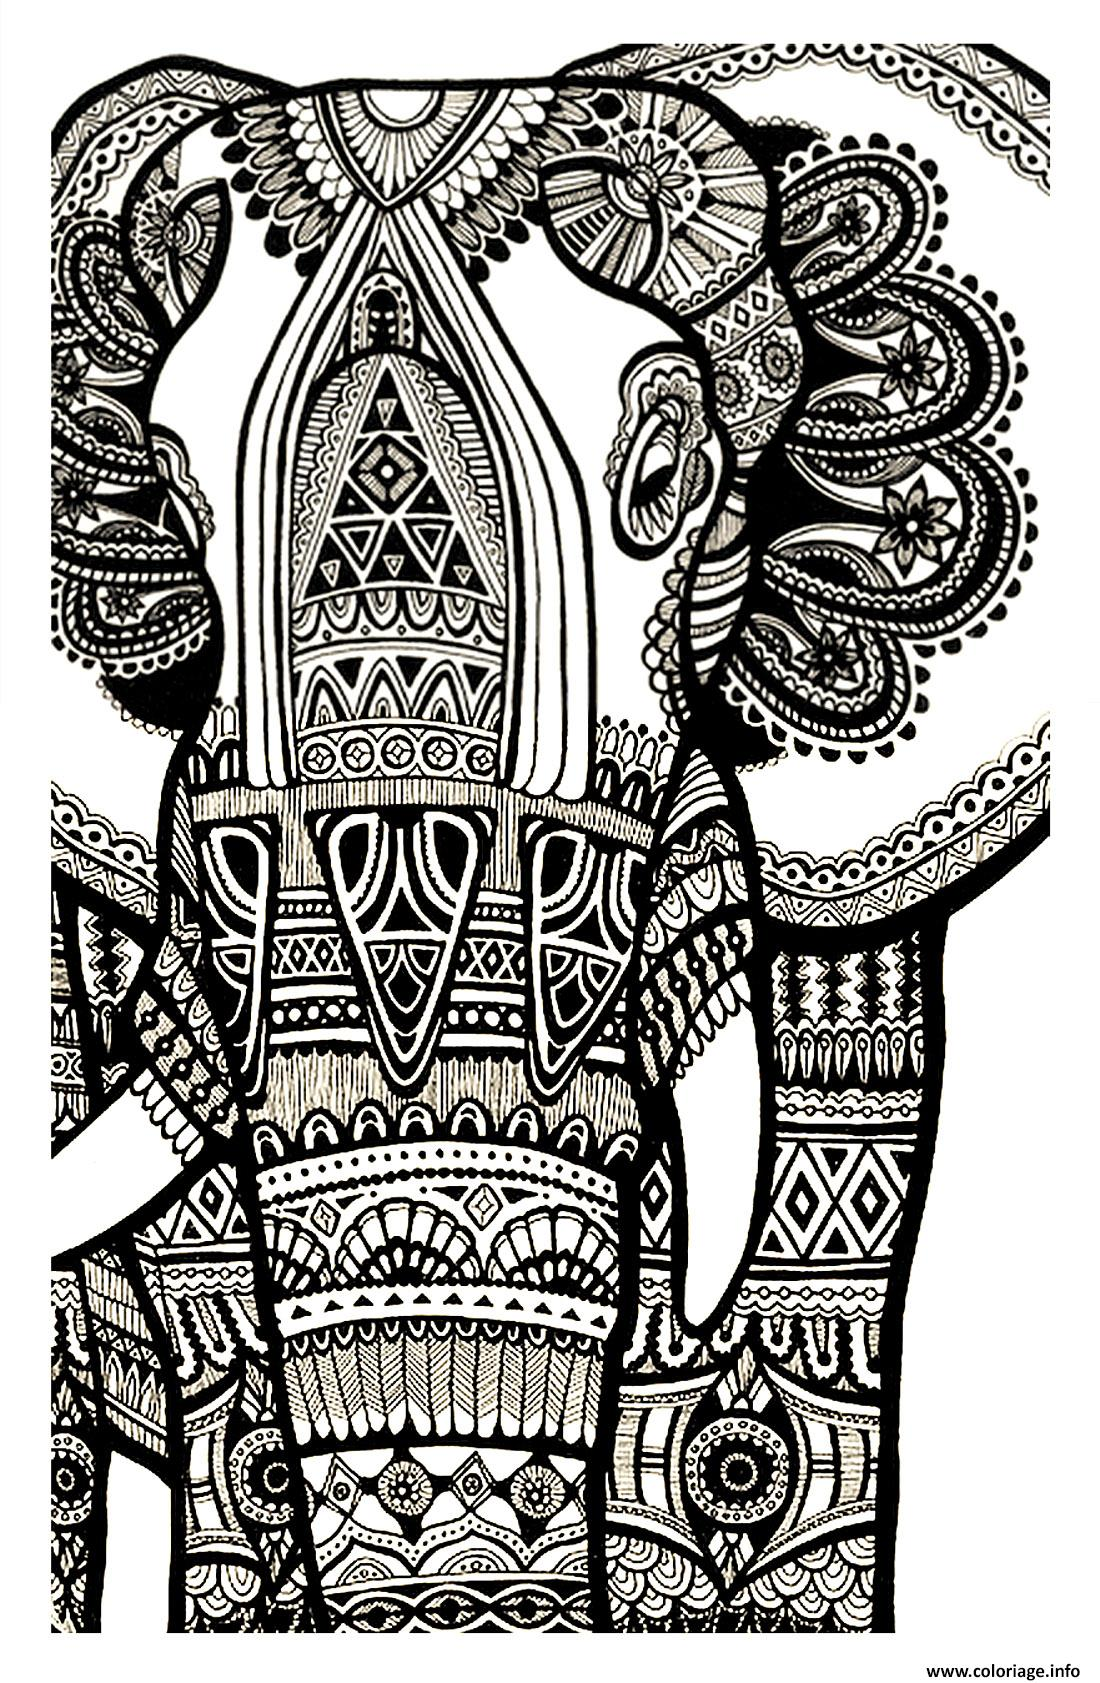 Coloriage Elephant Gratuit Adulte Jecolorie Com